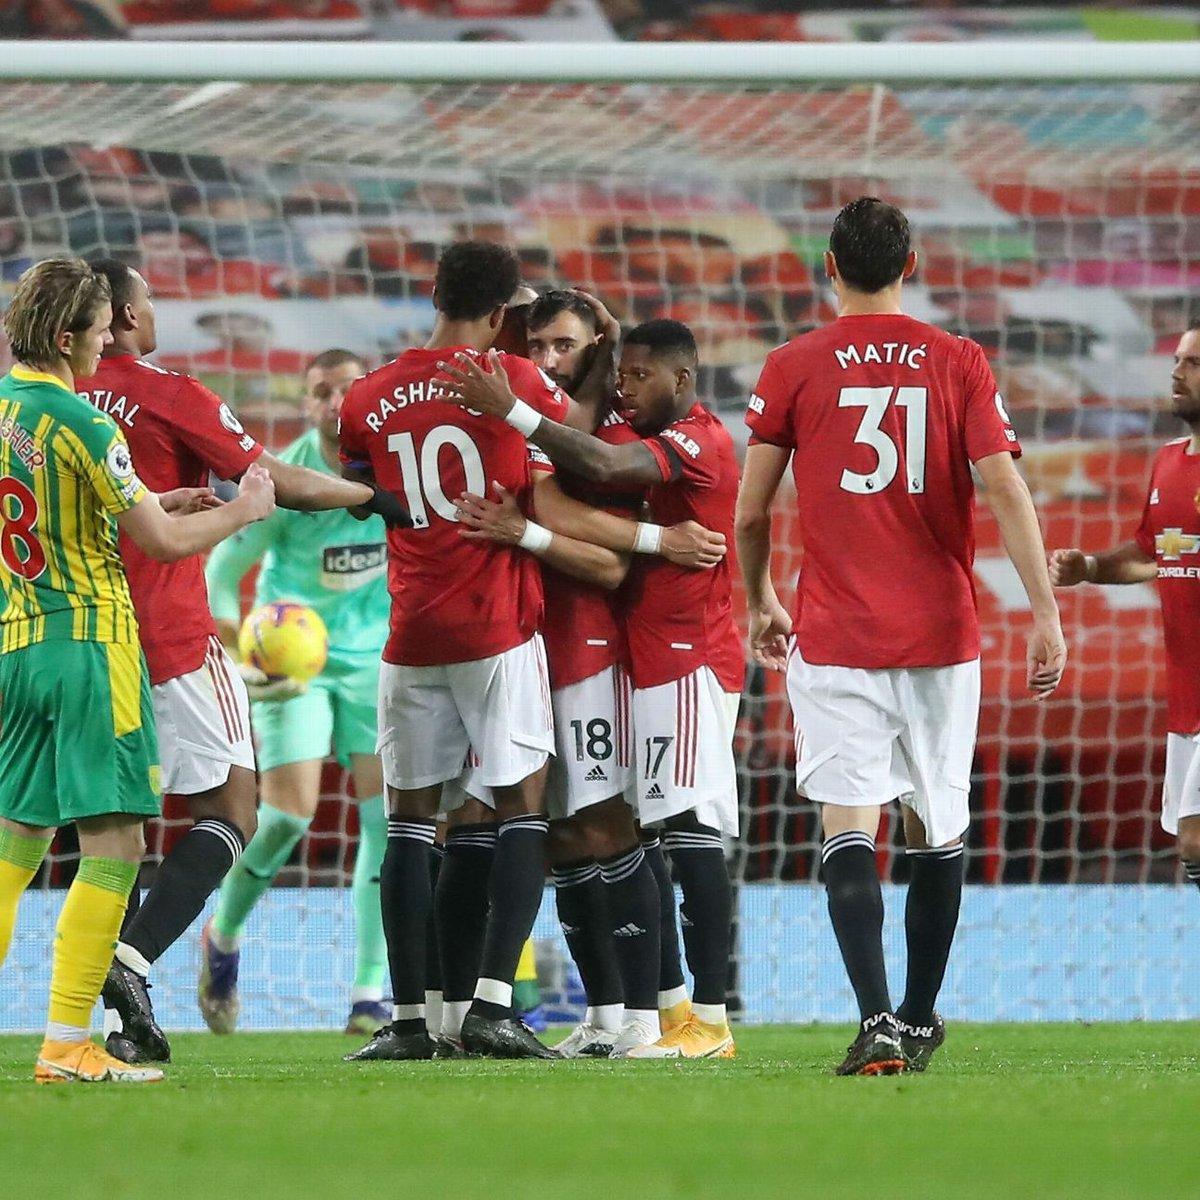 Manchester United vs. West Bromwich Albion - Football Match Report - November 21, 2020 Casino News - https://t.co/IP89PHSRFT https://t.co/rTiqkojVtU